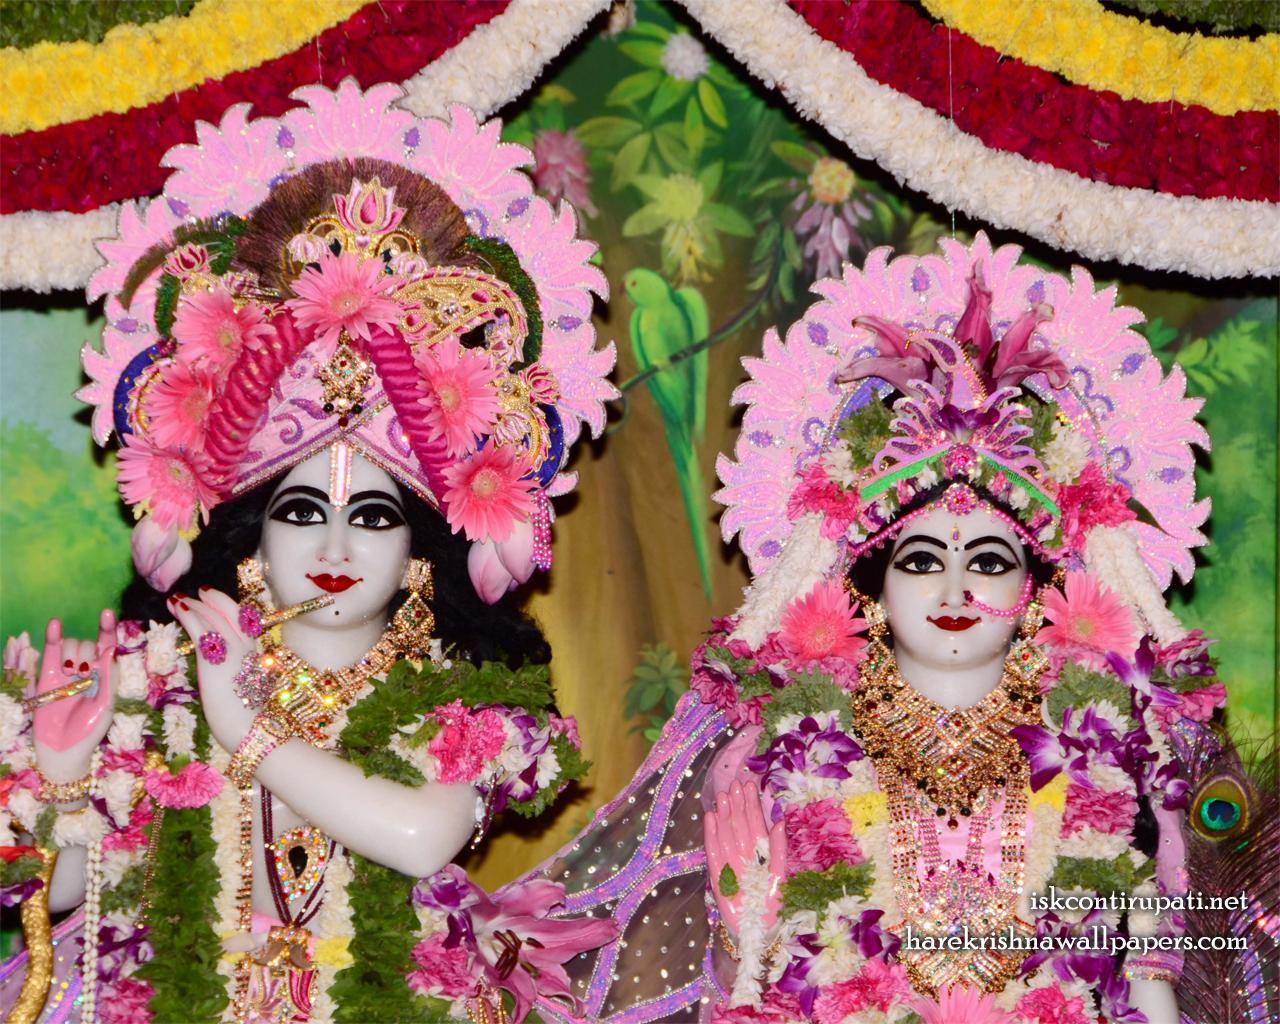 Sri Sri Radha Govinda Close up Wallpaper (006) Size 1280x1024 Download